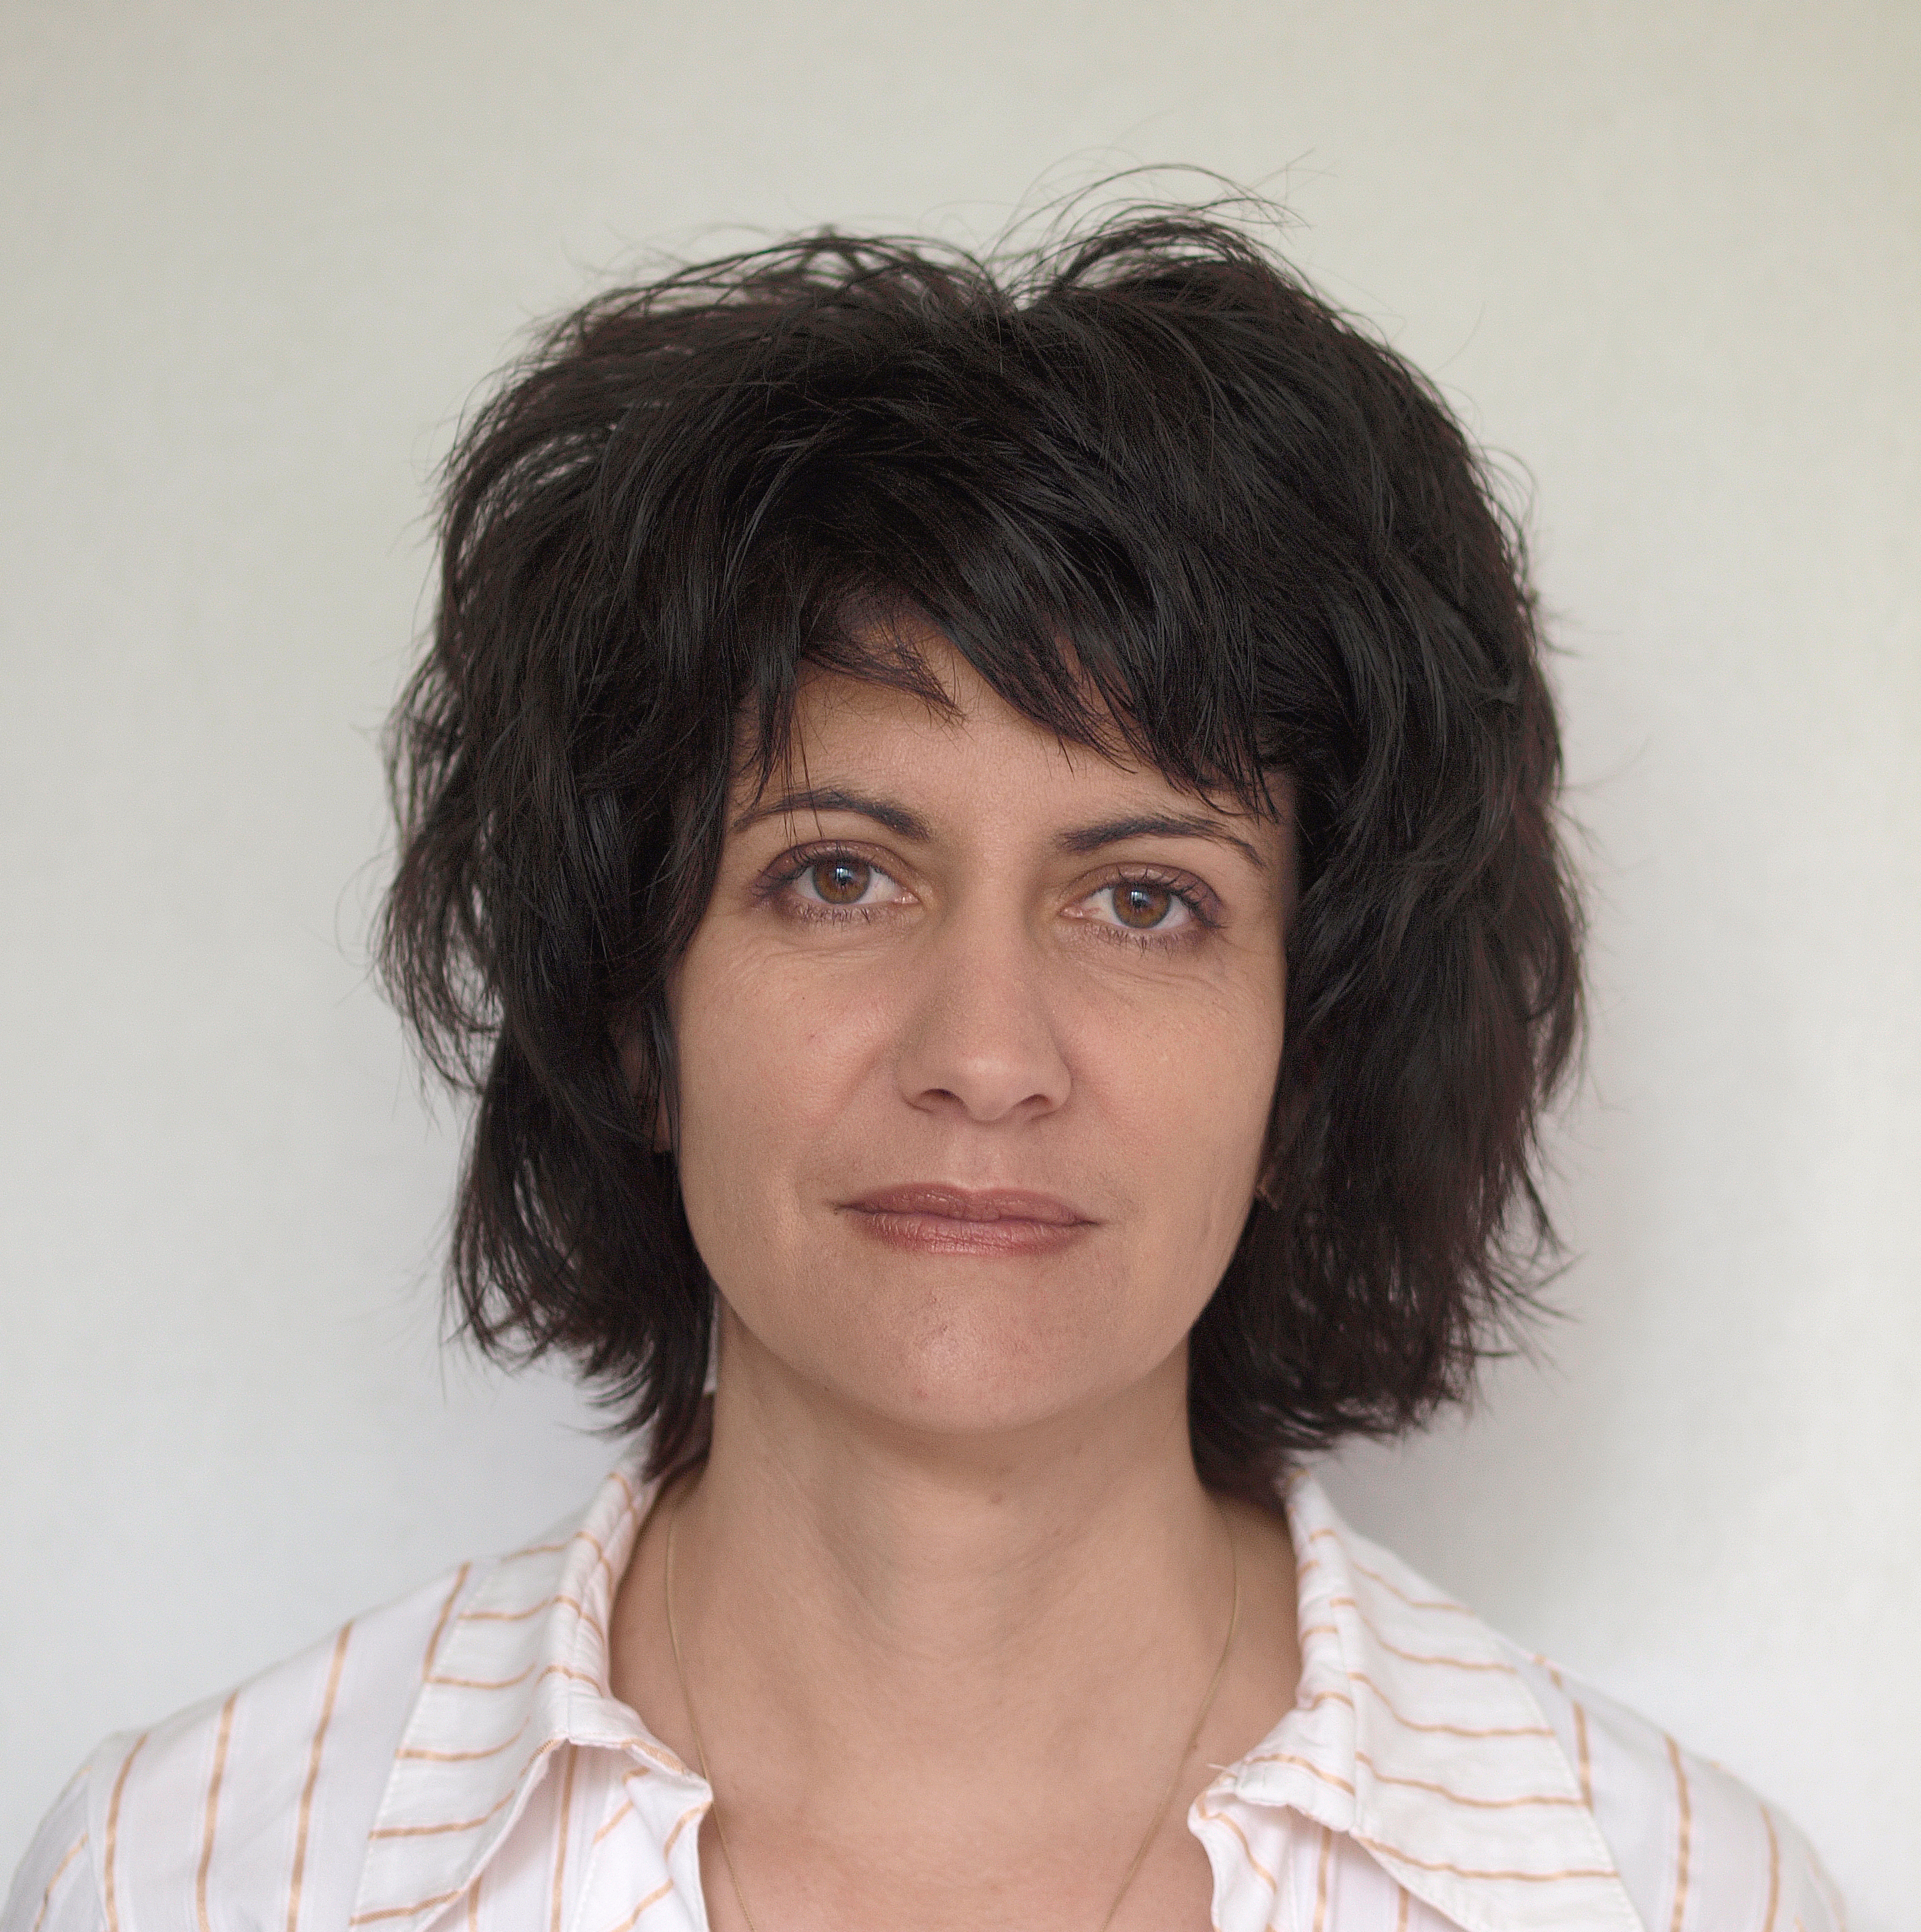 Margarita Georgieva